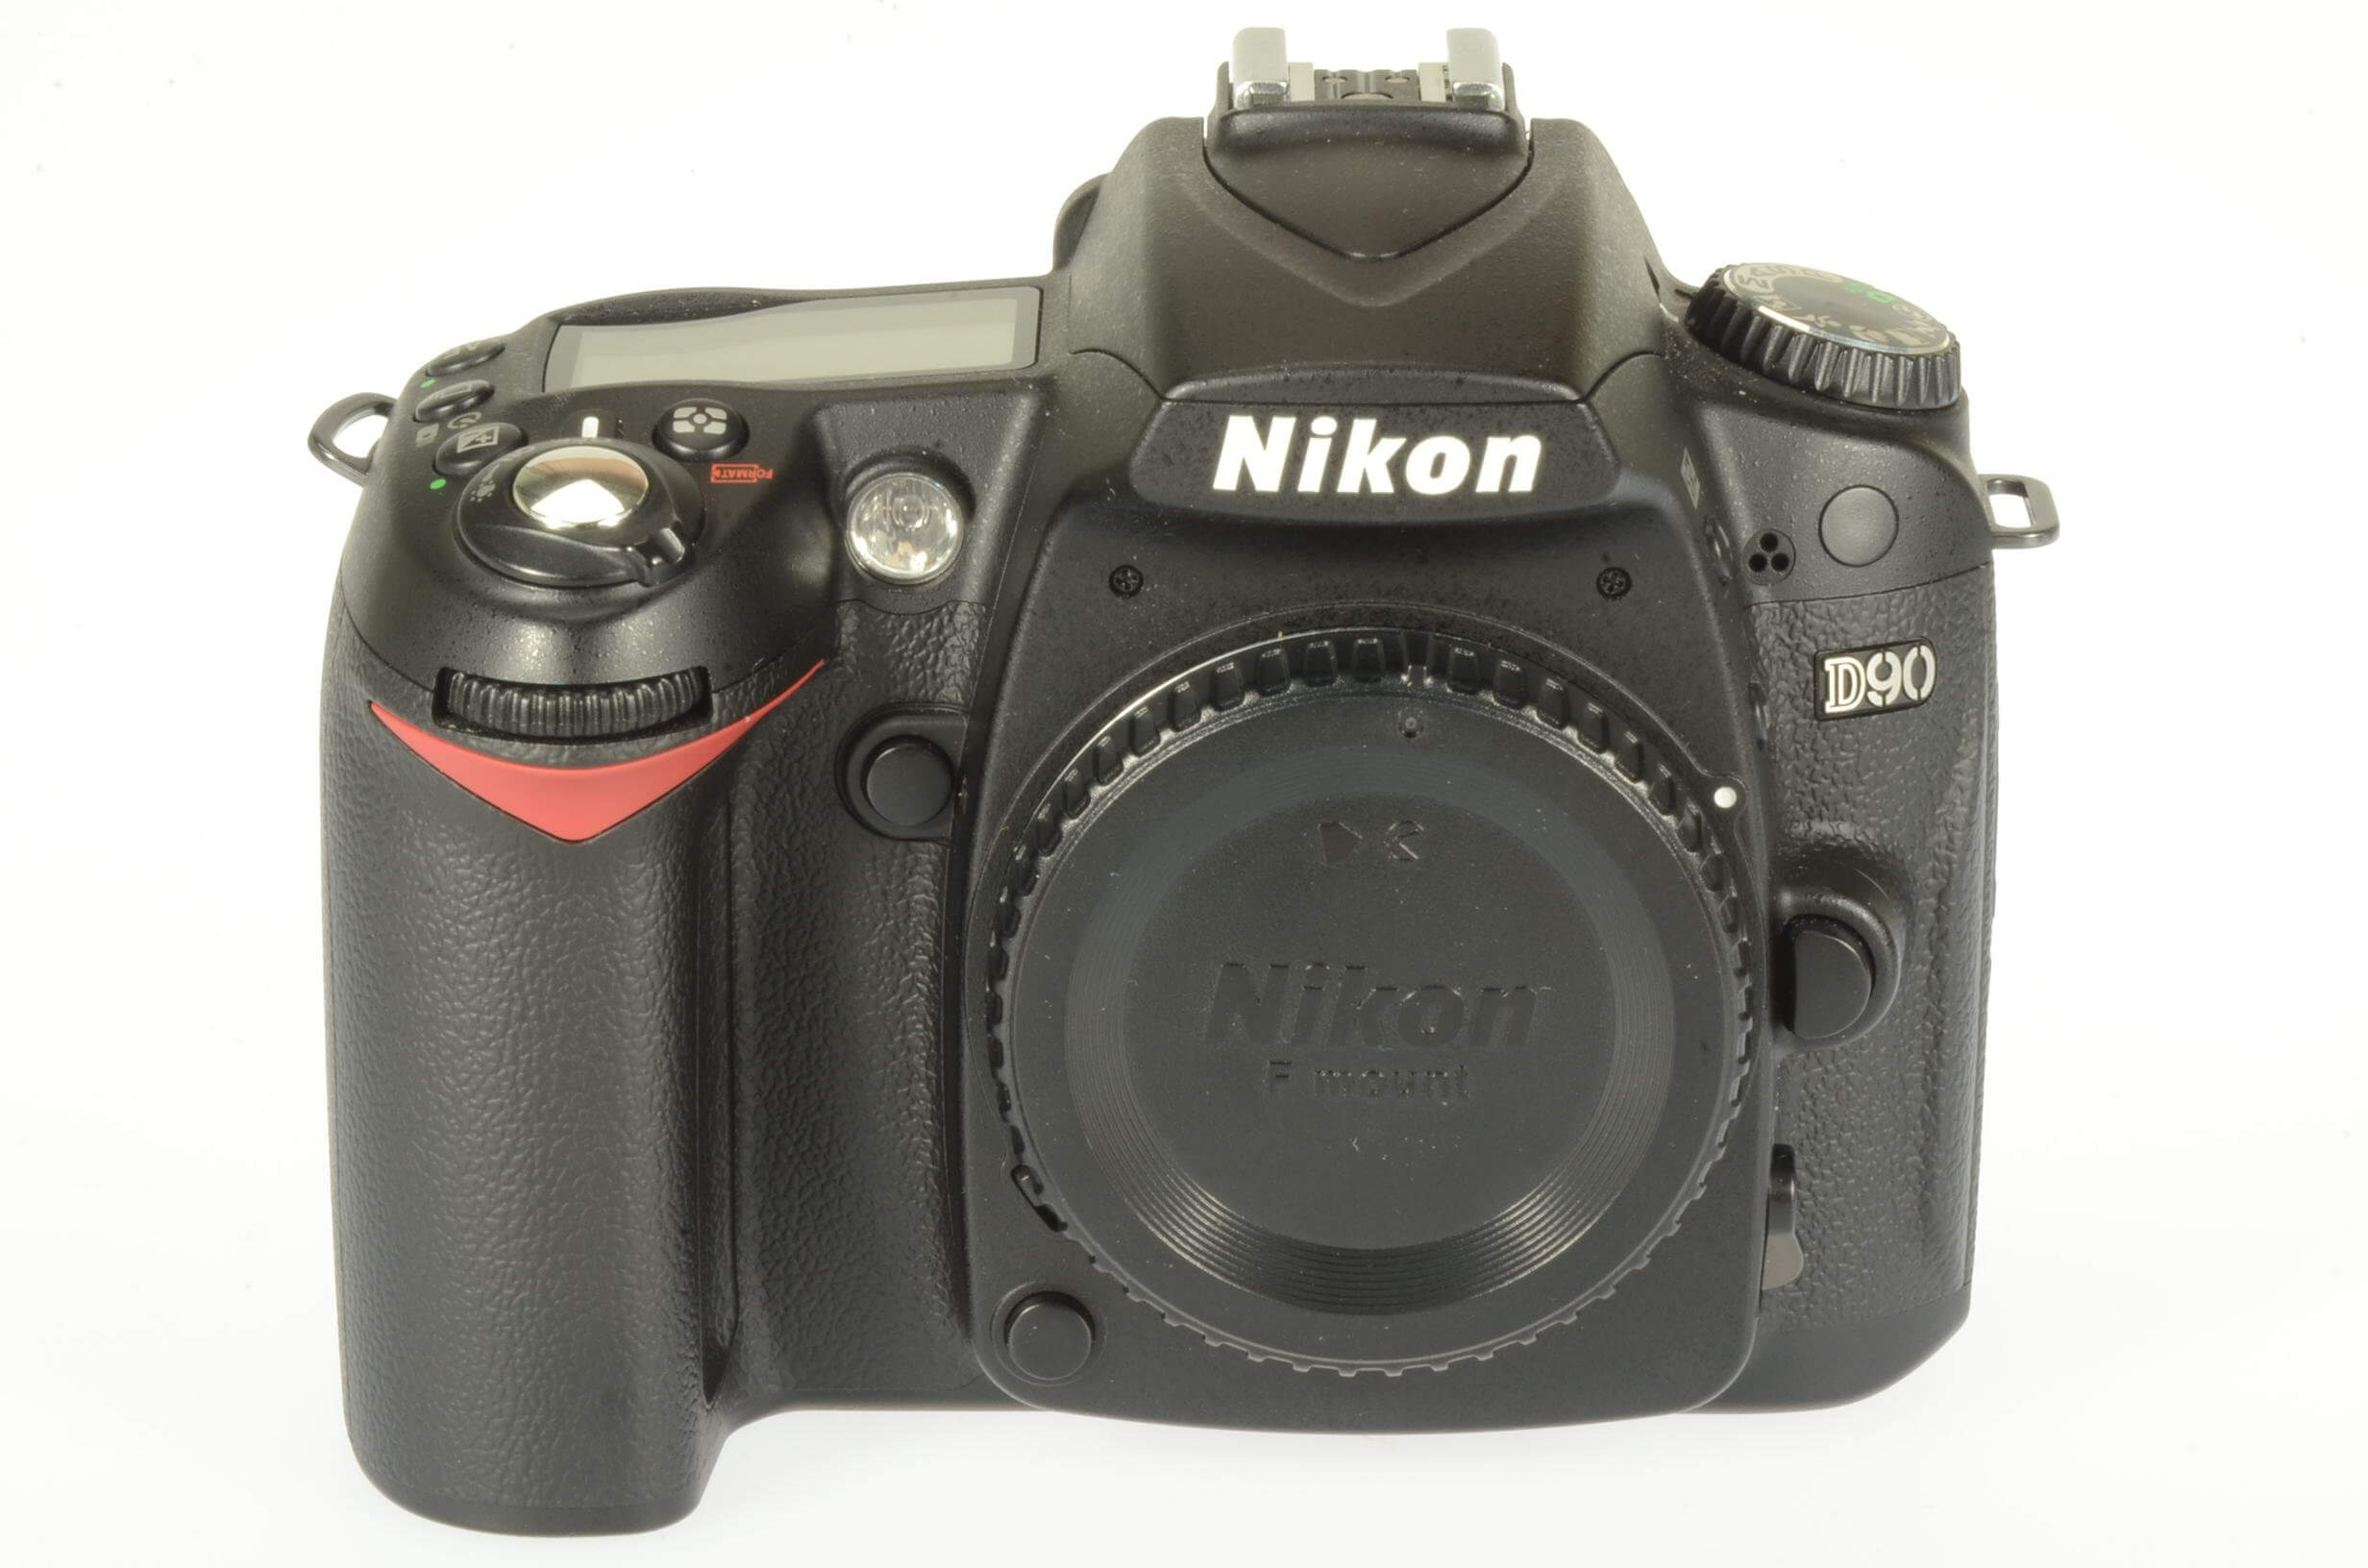 Nikon D90 body, 5594 actuations, excellent condition, almost mint